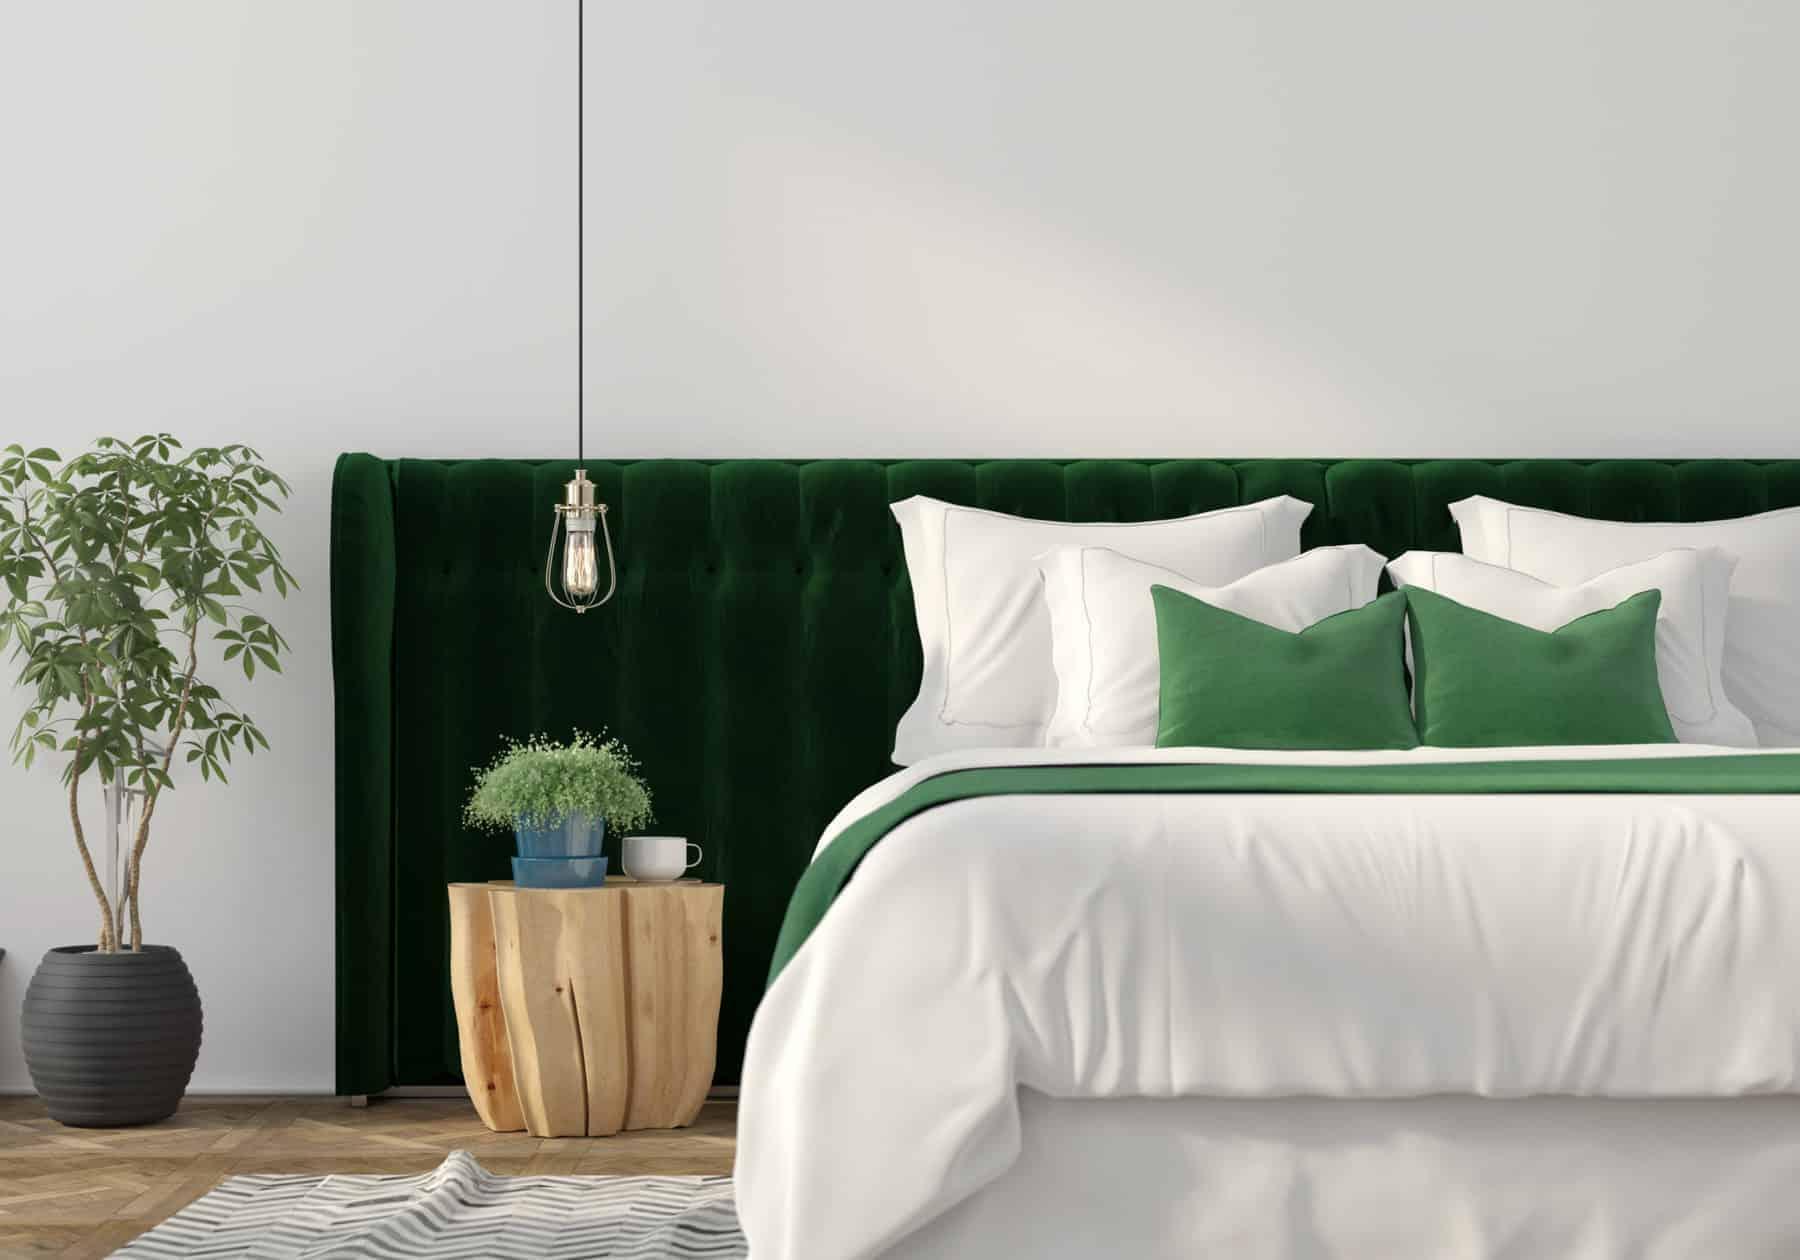 Organic Sheets and Non-Toxic Bedding - Green at Home